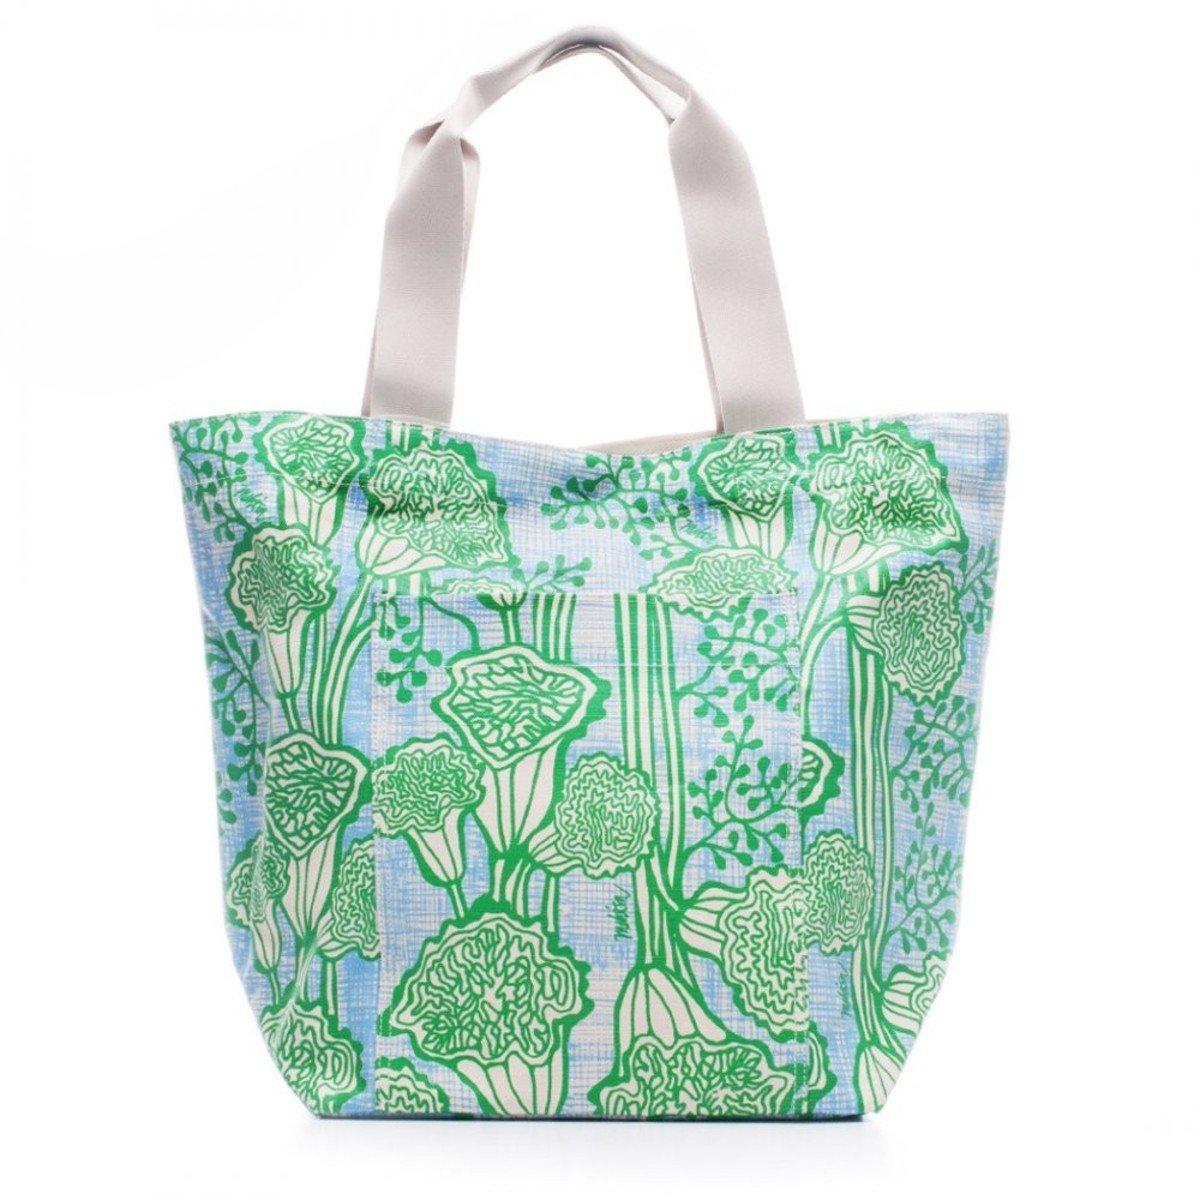 沙灘袋 - Green Grass